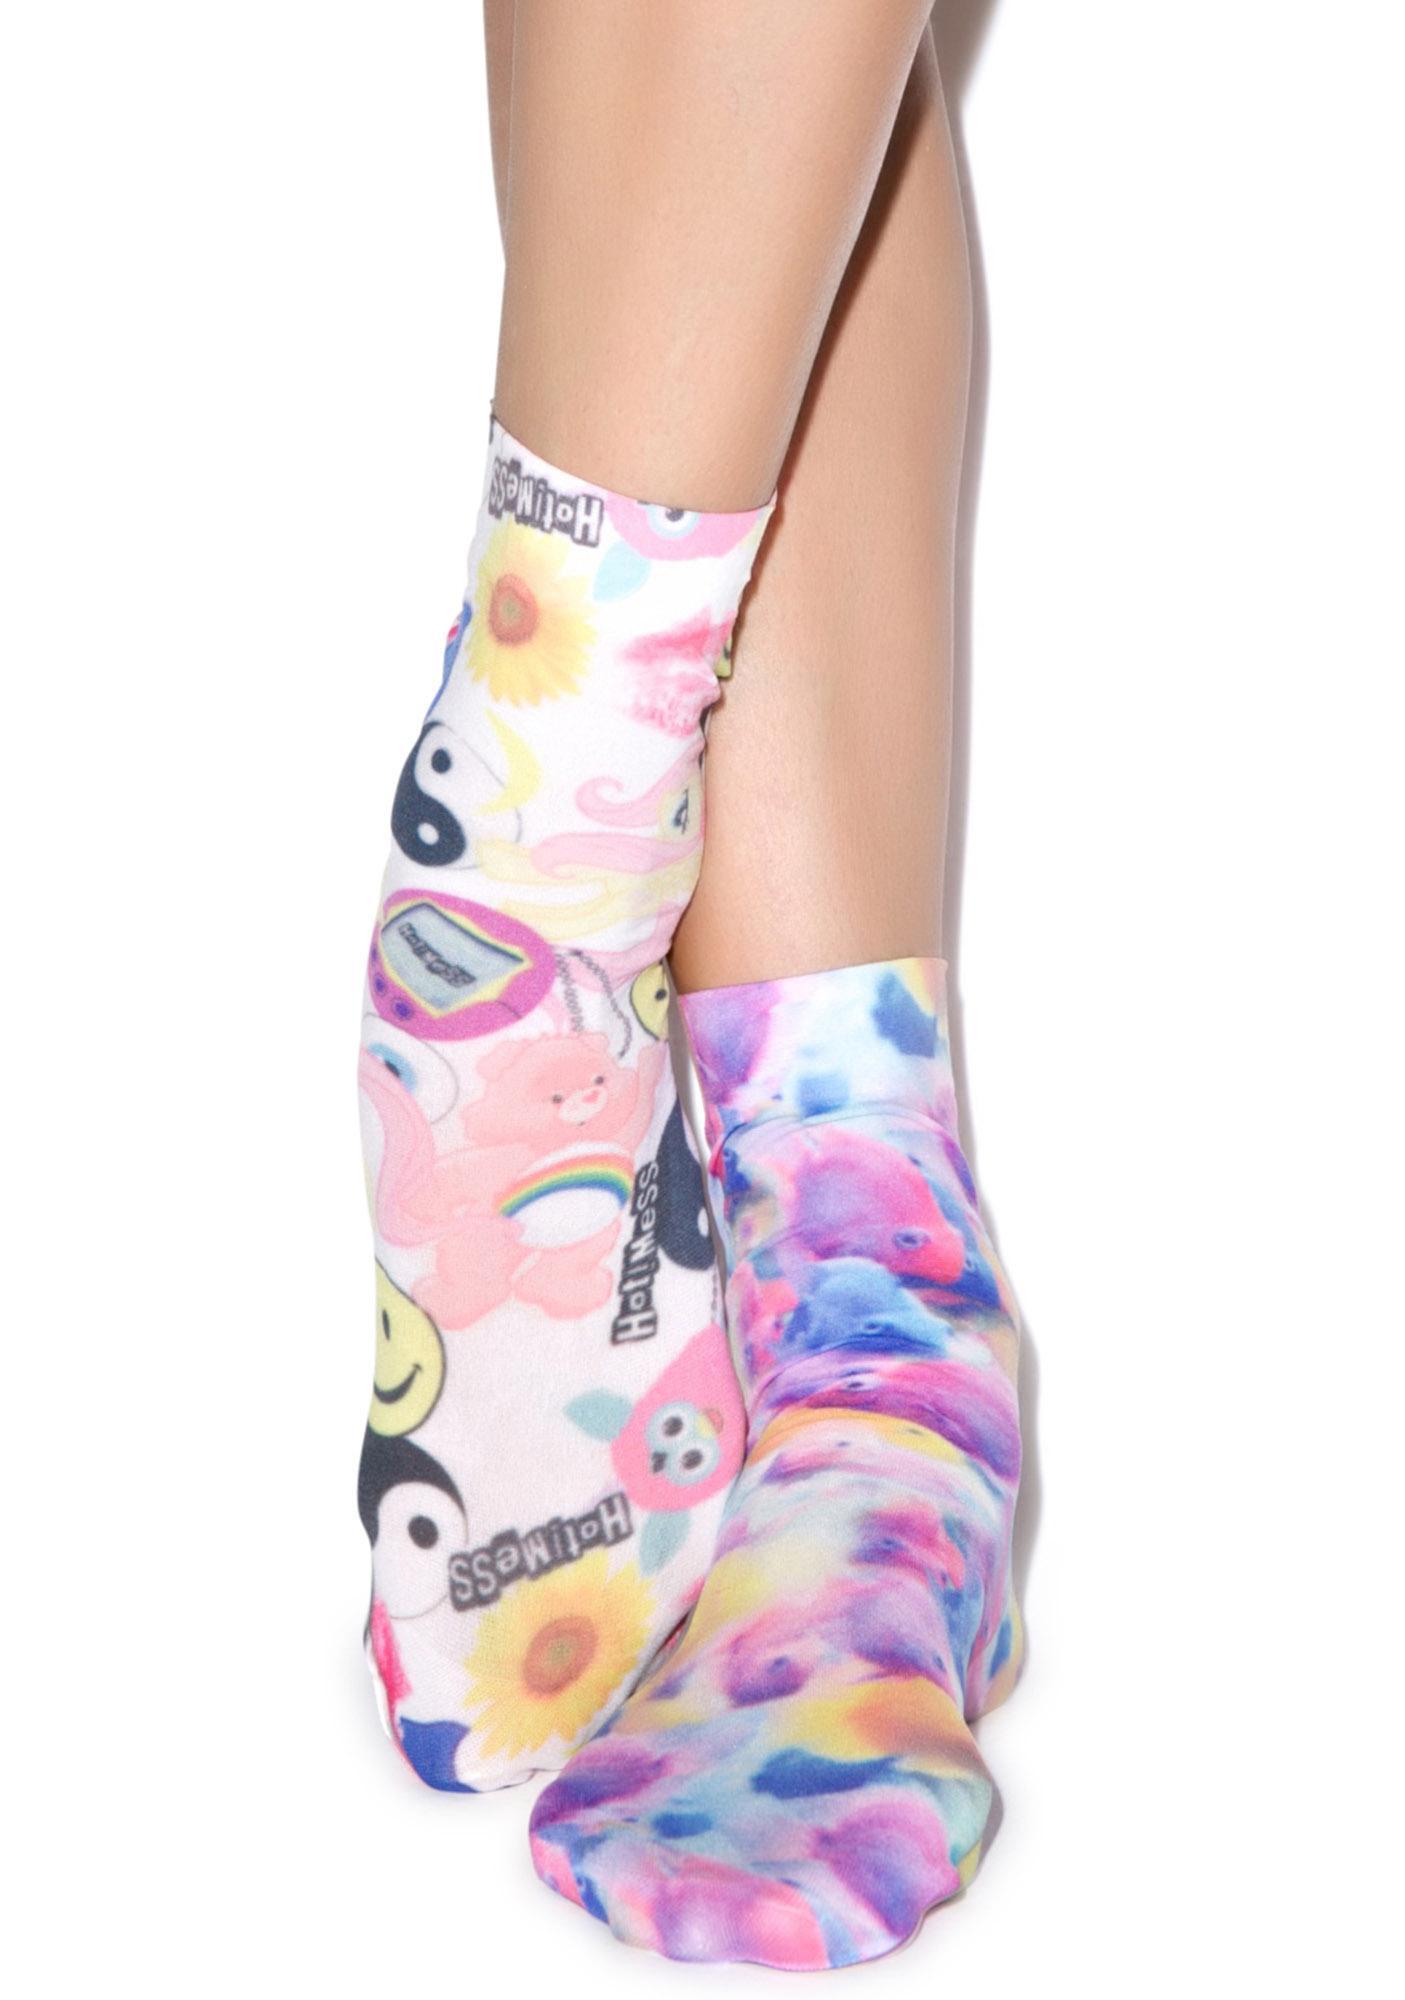 Hot!MeSS Toyshop & Fish Pop Socks Set